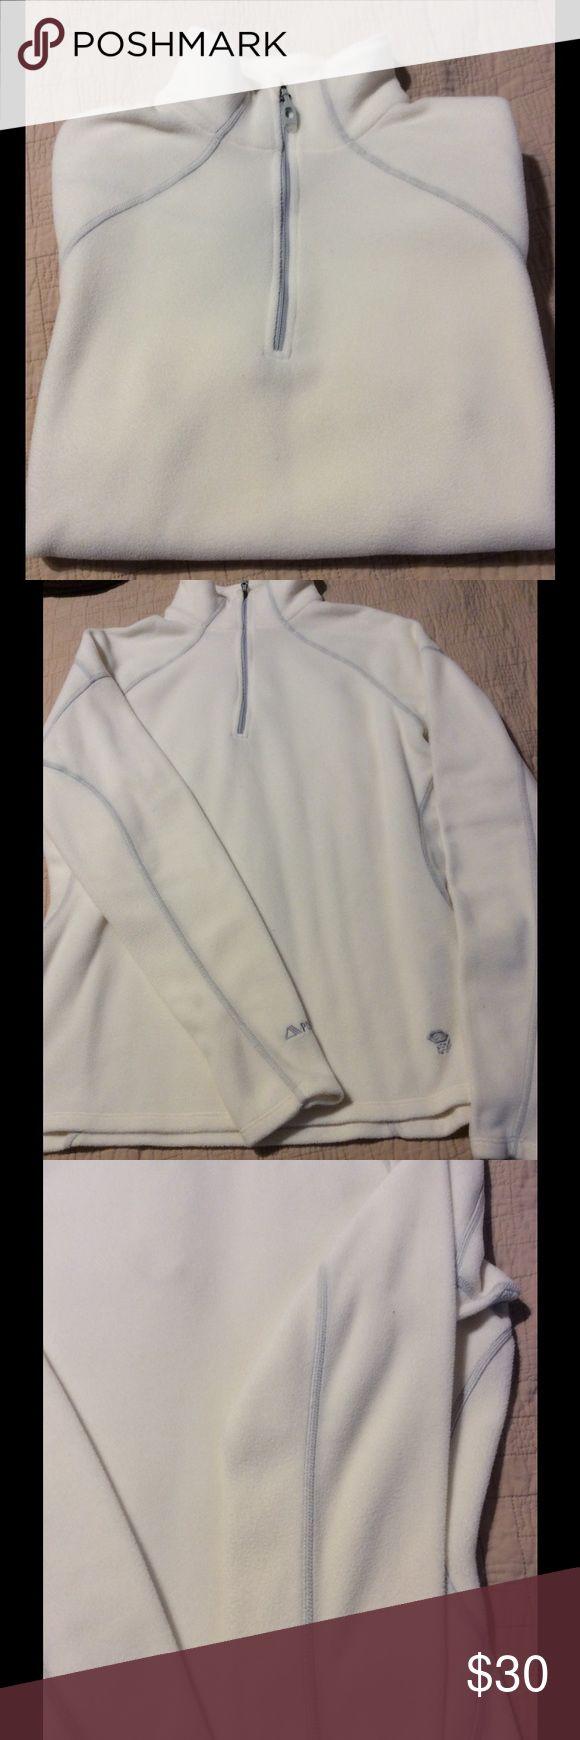 Mountain Hardwear Fleece Slightly used Mountain Hardwear Jackets & Coats